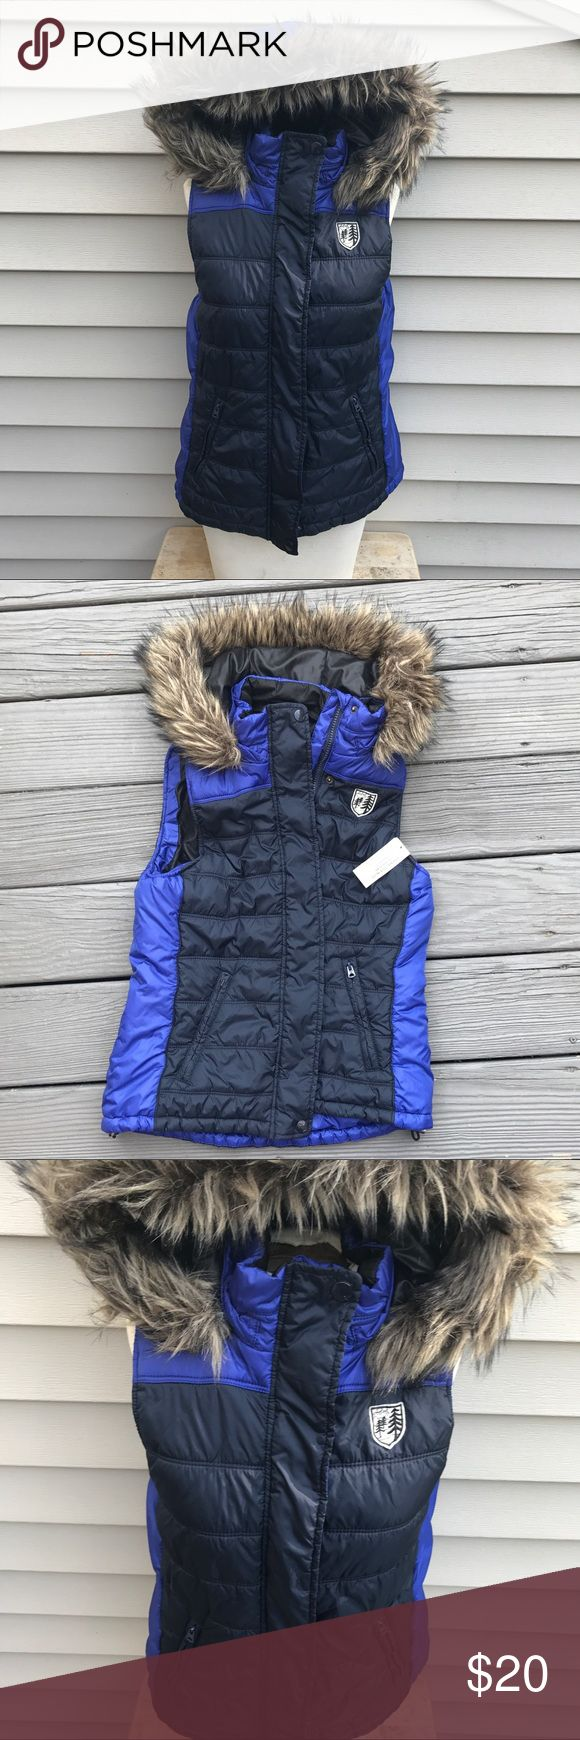 NWT American eagle winter puff vest fur hood large NWT American eagle winter puff vest fur hood large American Eagle Outfitters Jackets & Coats Vests